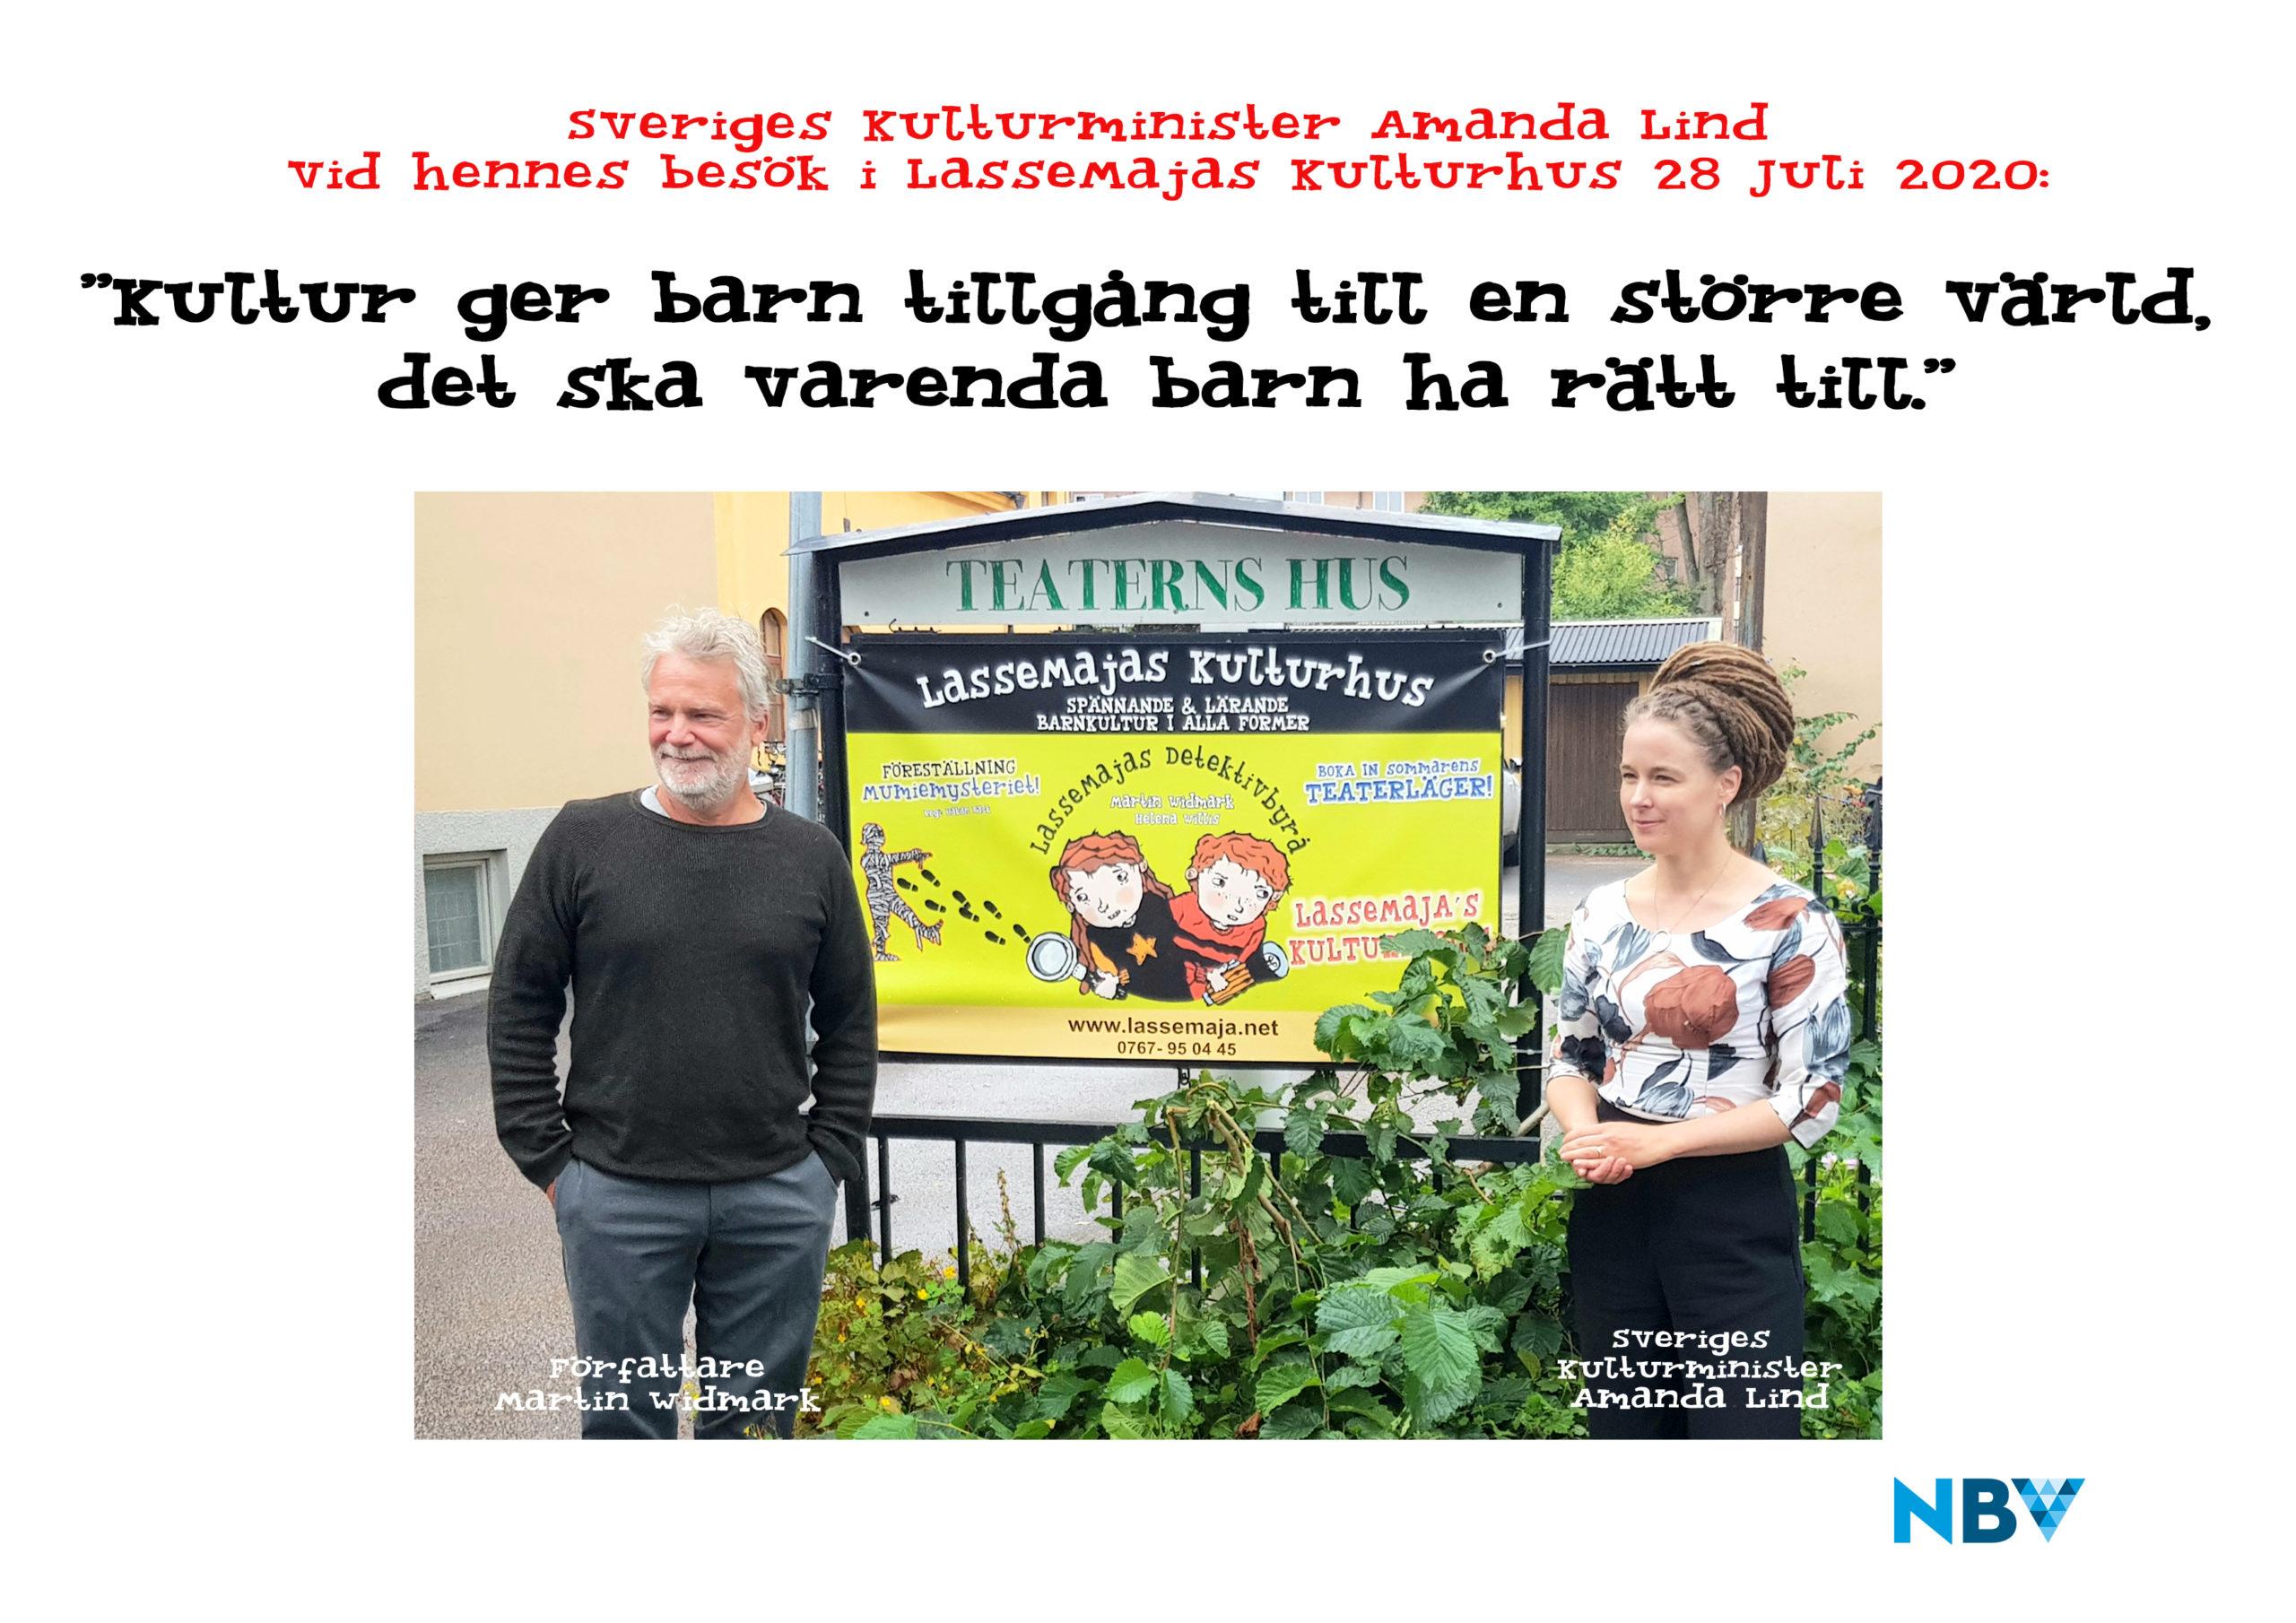 Kulturminister-Amanda-Lind